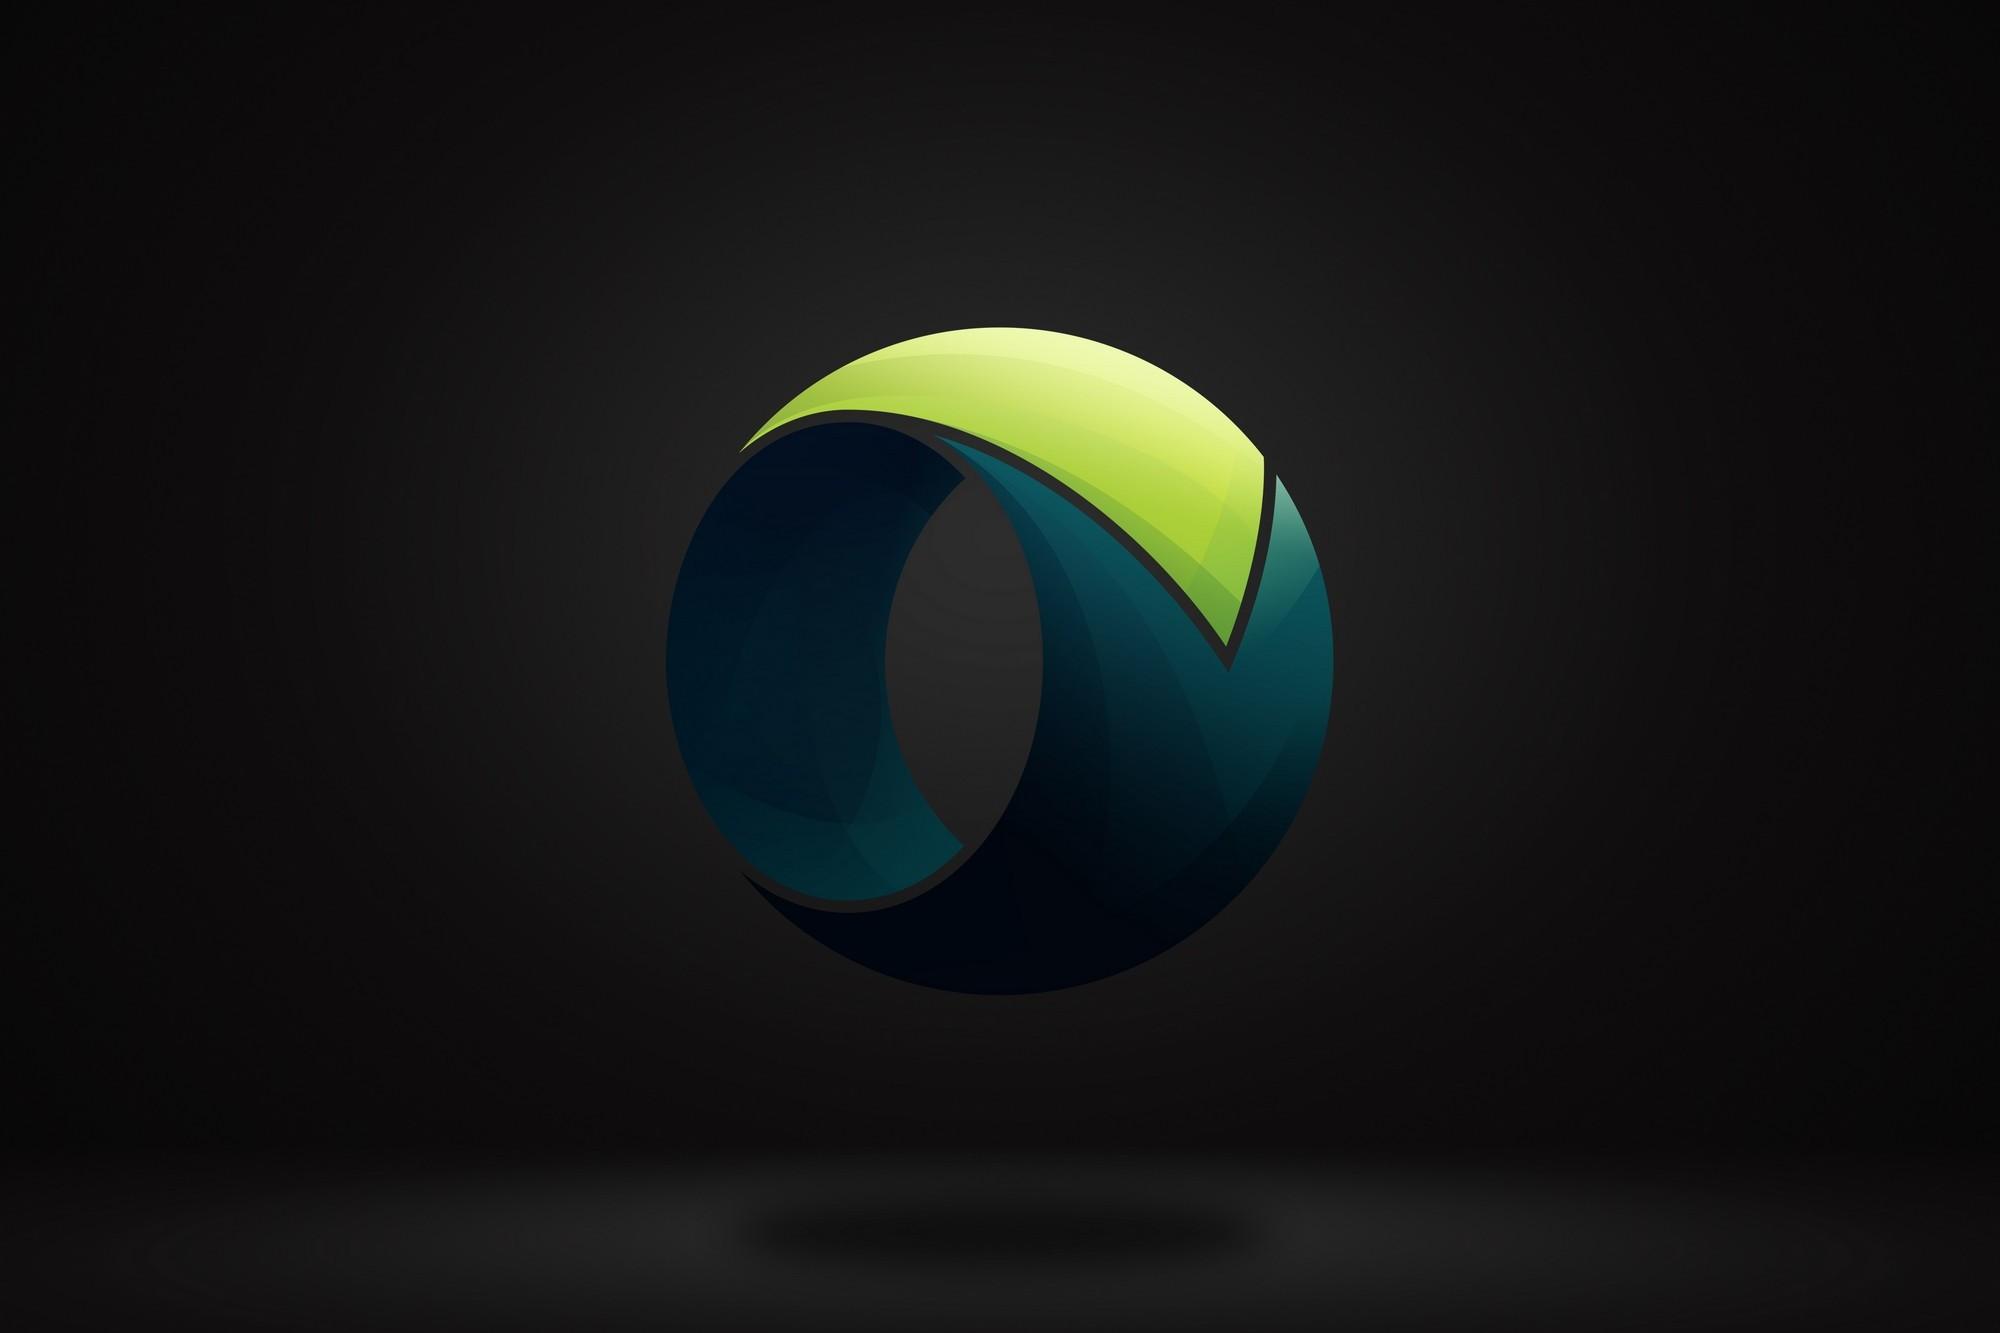 om_logotype_remion_design_branding_identity_01